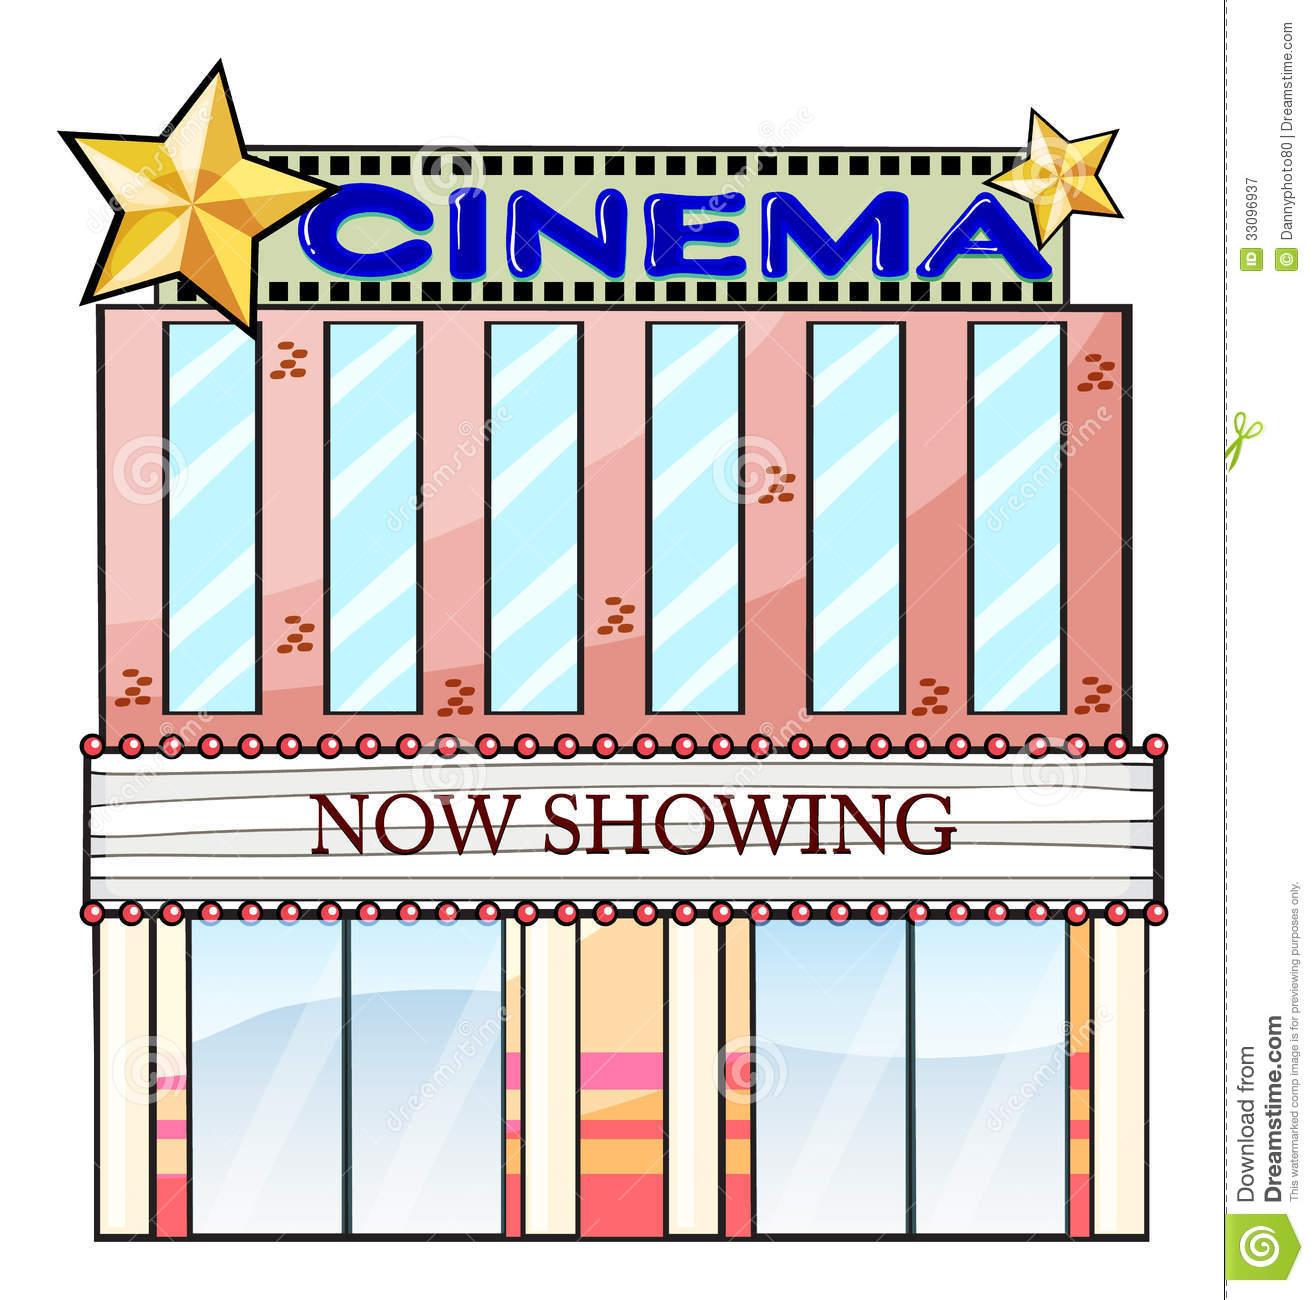 Movie Theater Clipart Clipart Panda Free-Movie Theater Clipart Clipart Panda Free Clipart Images-14